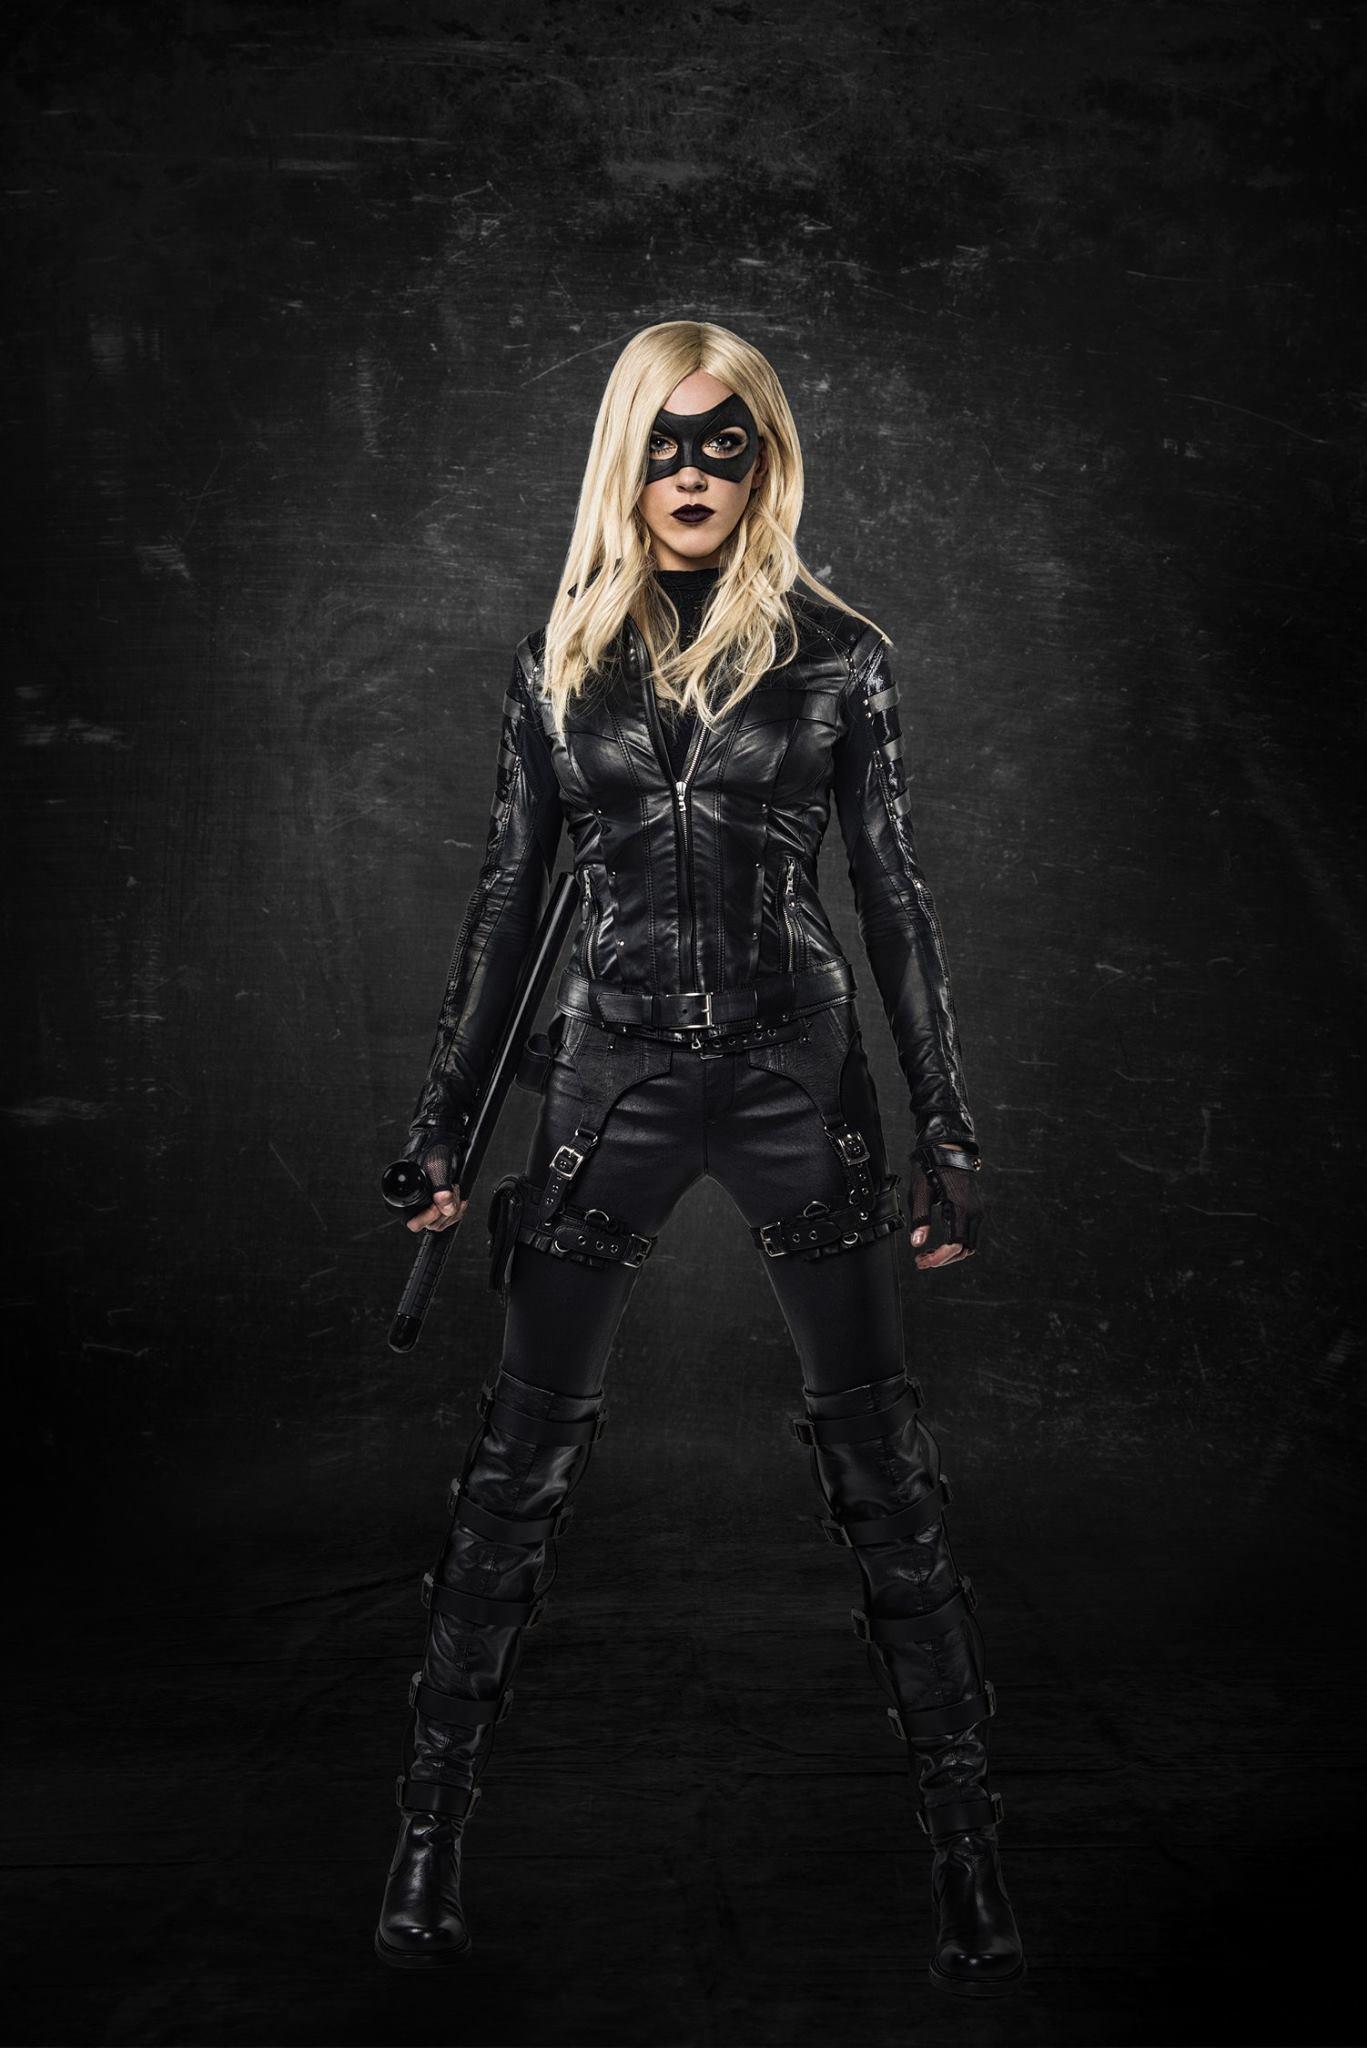 Katie Cassidy - Arrow Black Canary Season 3 Promos